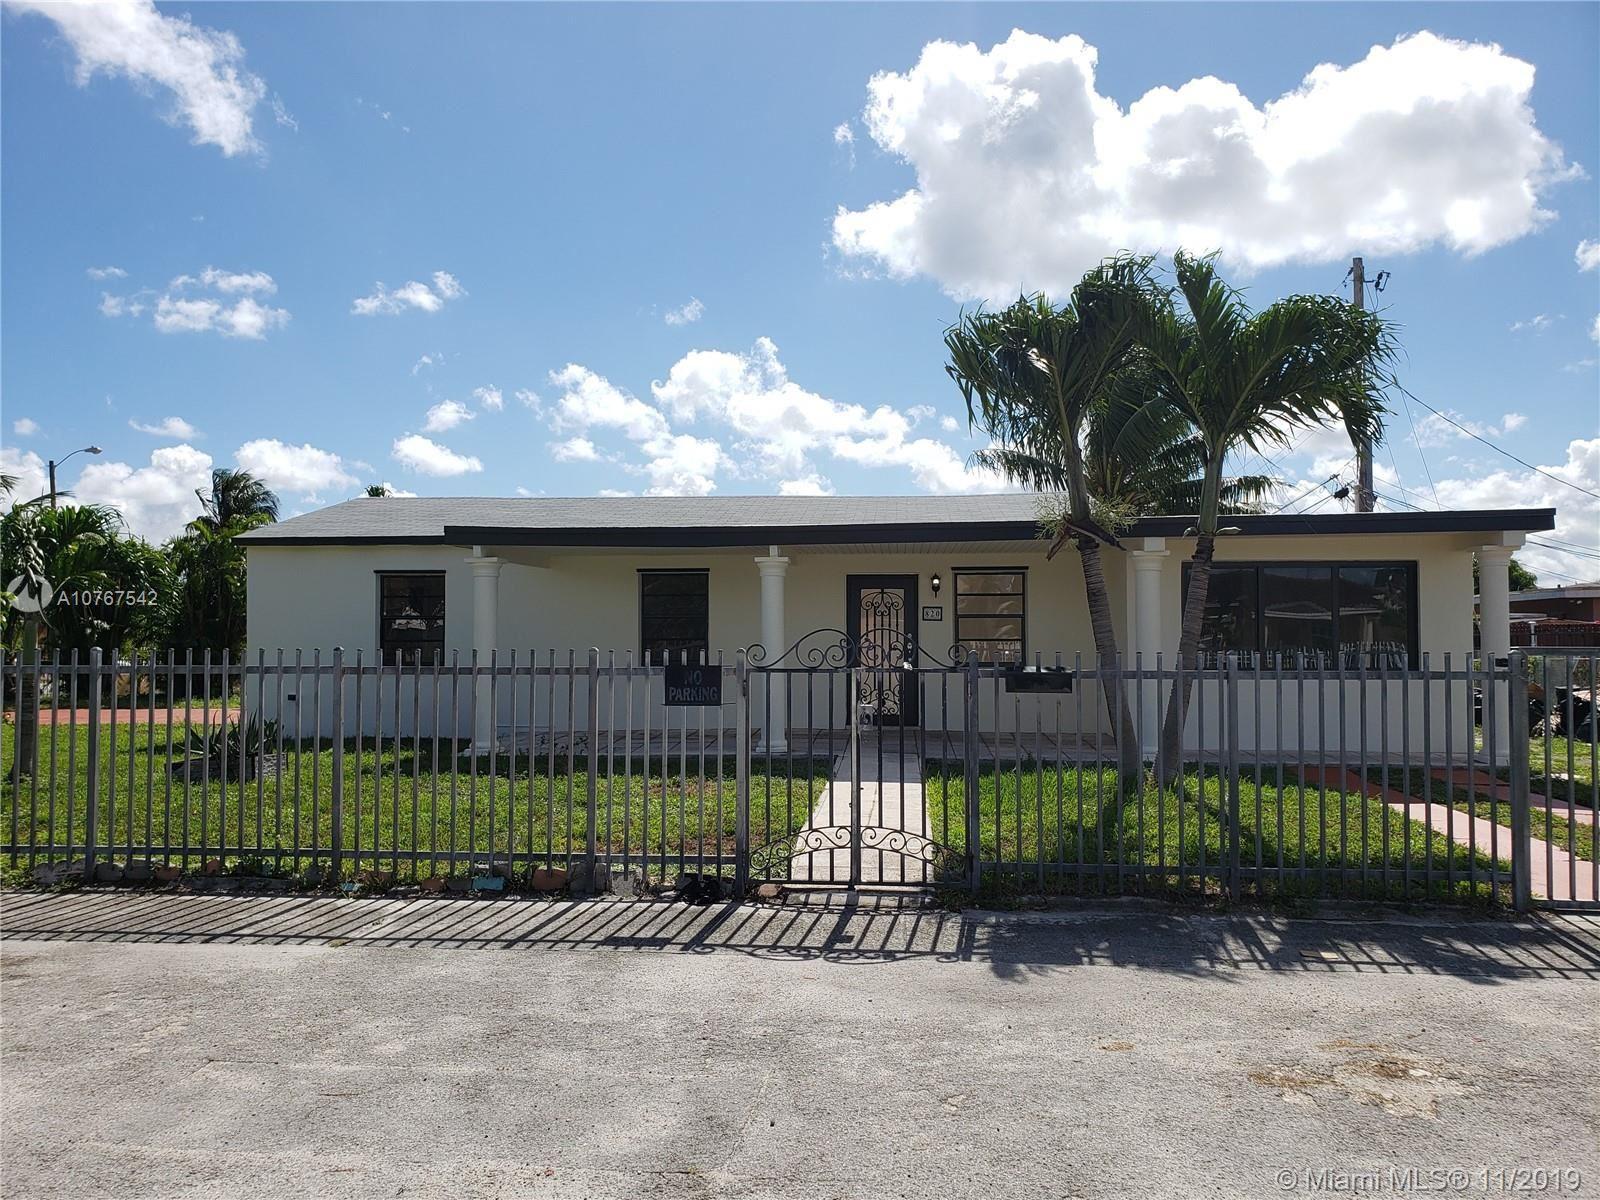 820 E 39th Pl, Hialeah, FL 33013 - MLS#: A10767542